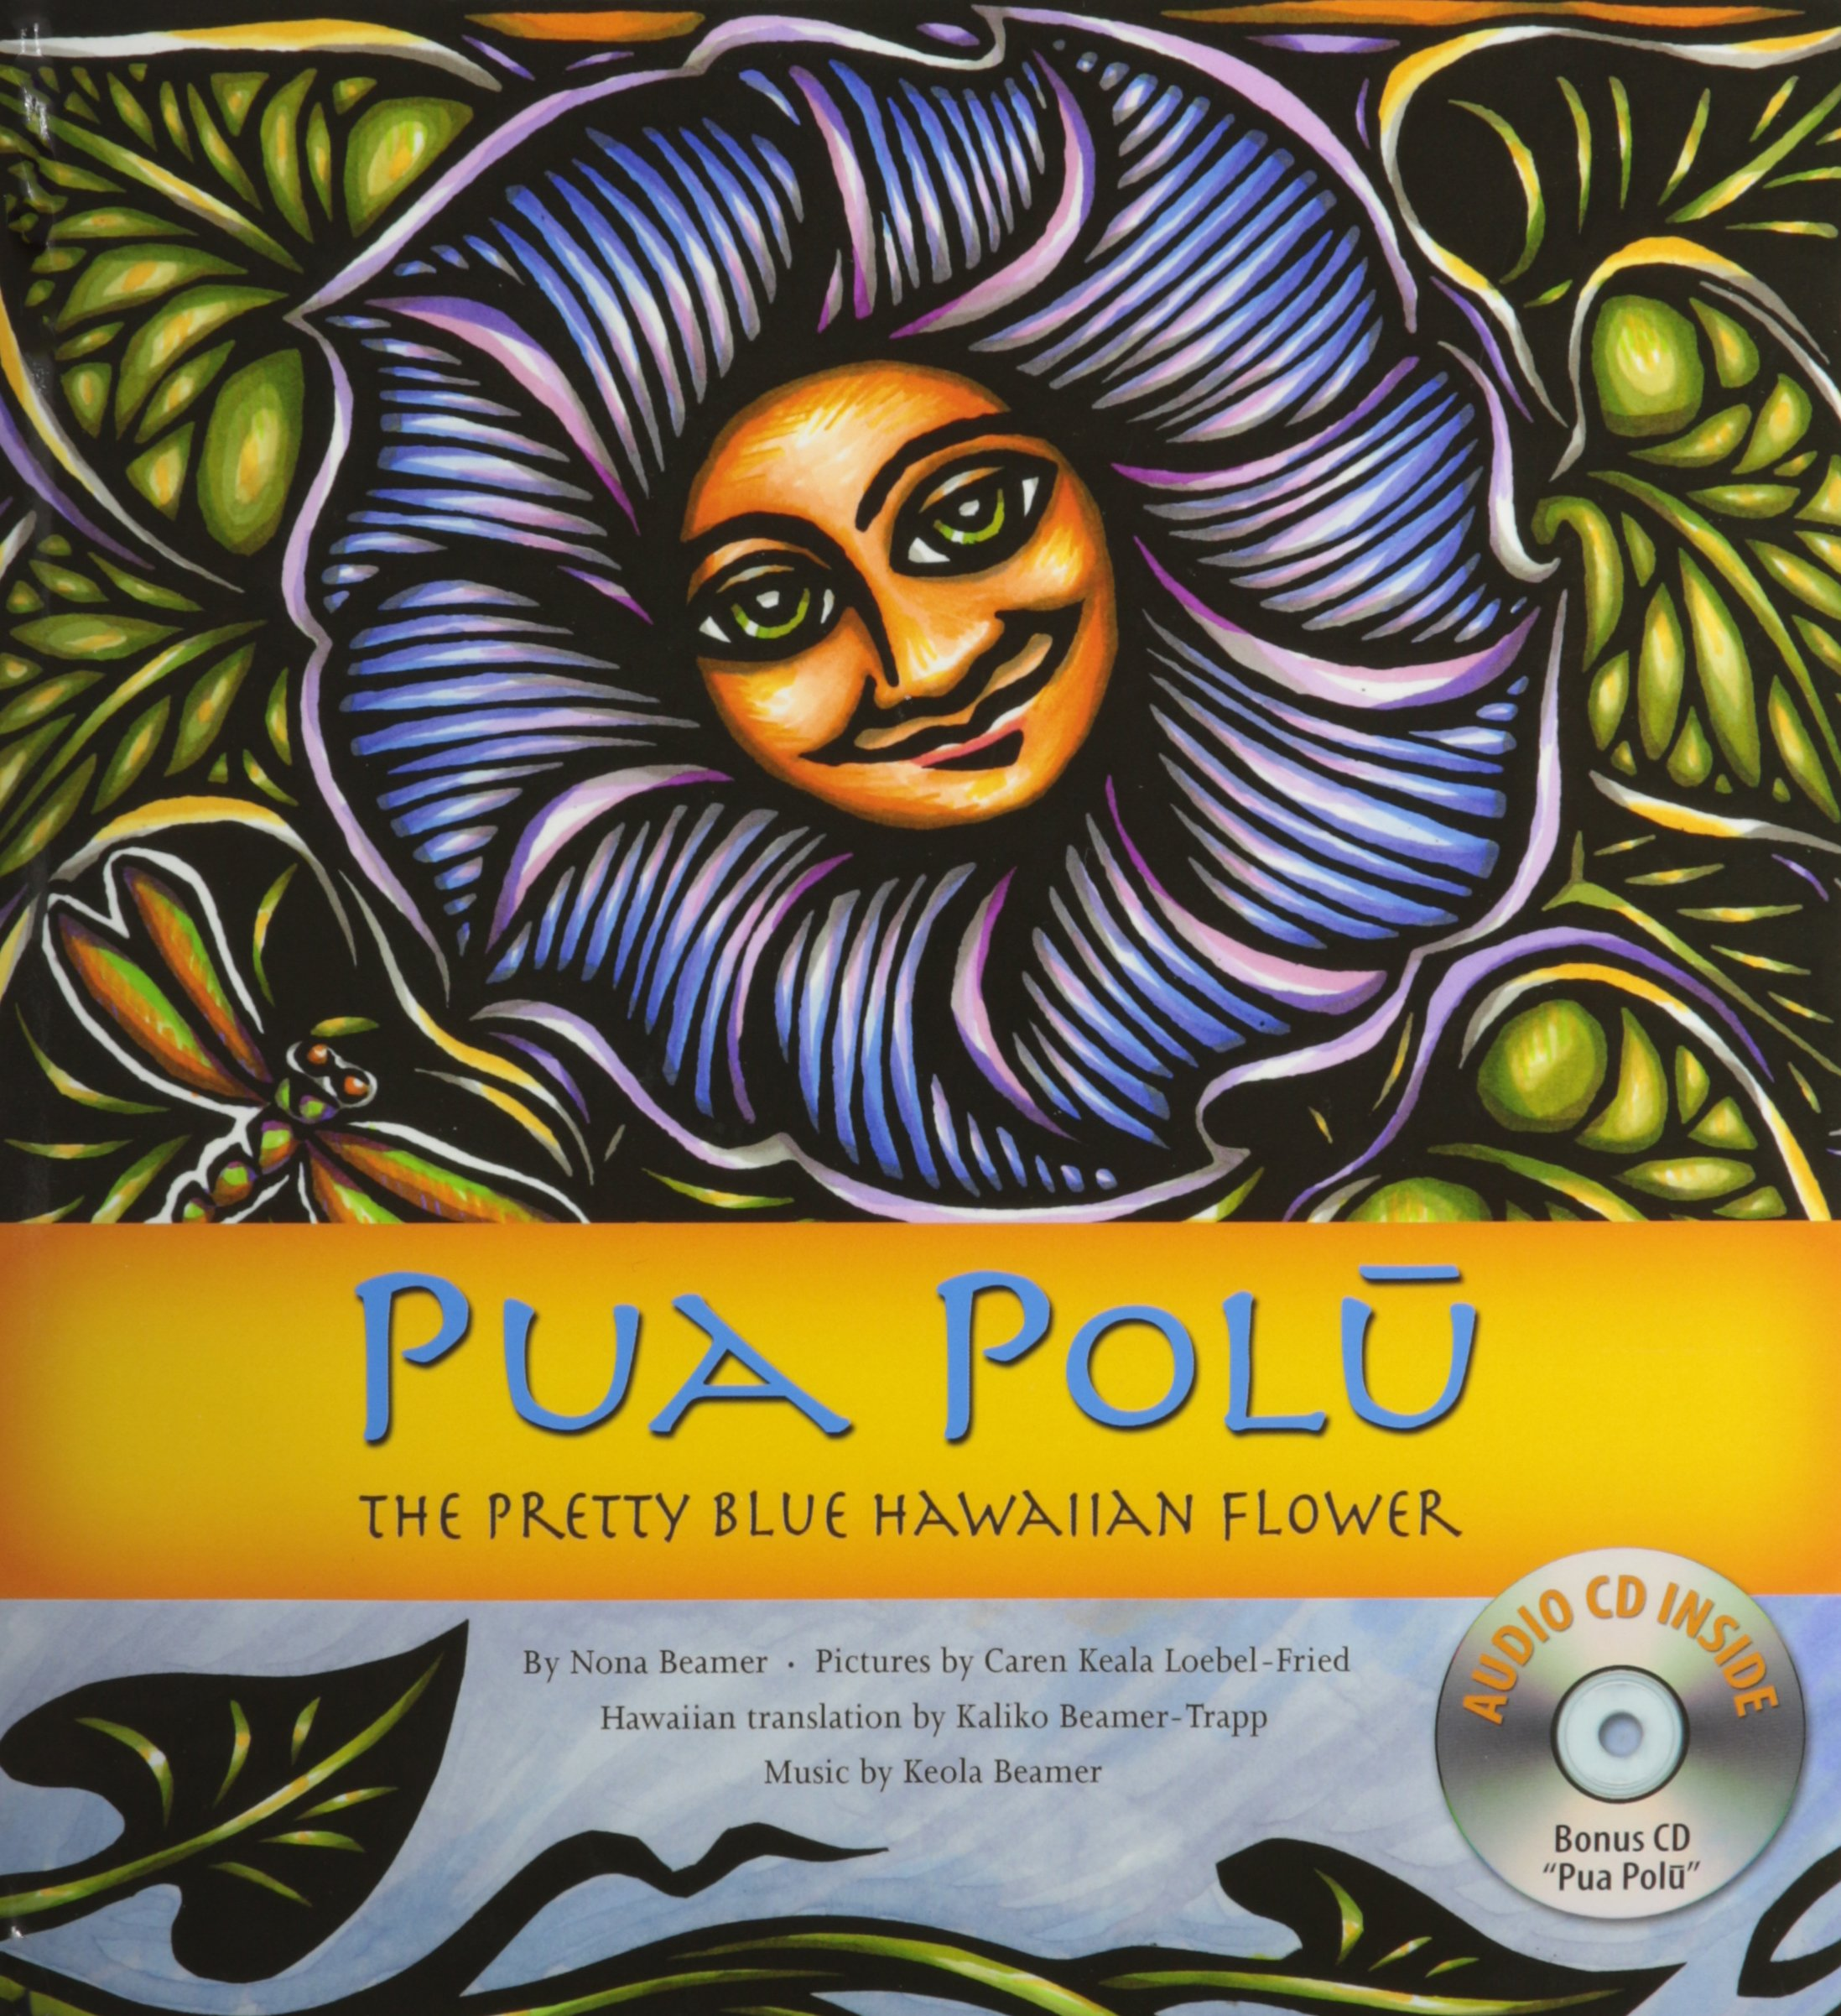 Pua Polu: The Pretty Blue Hawaiian Flower